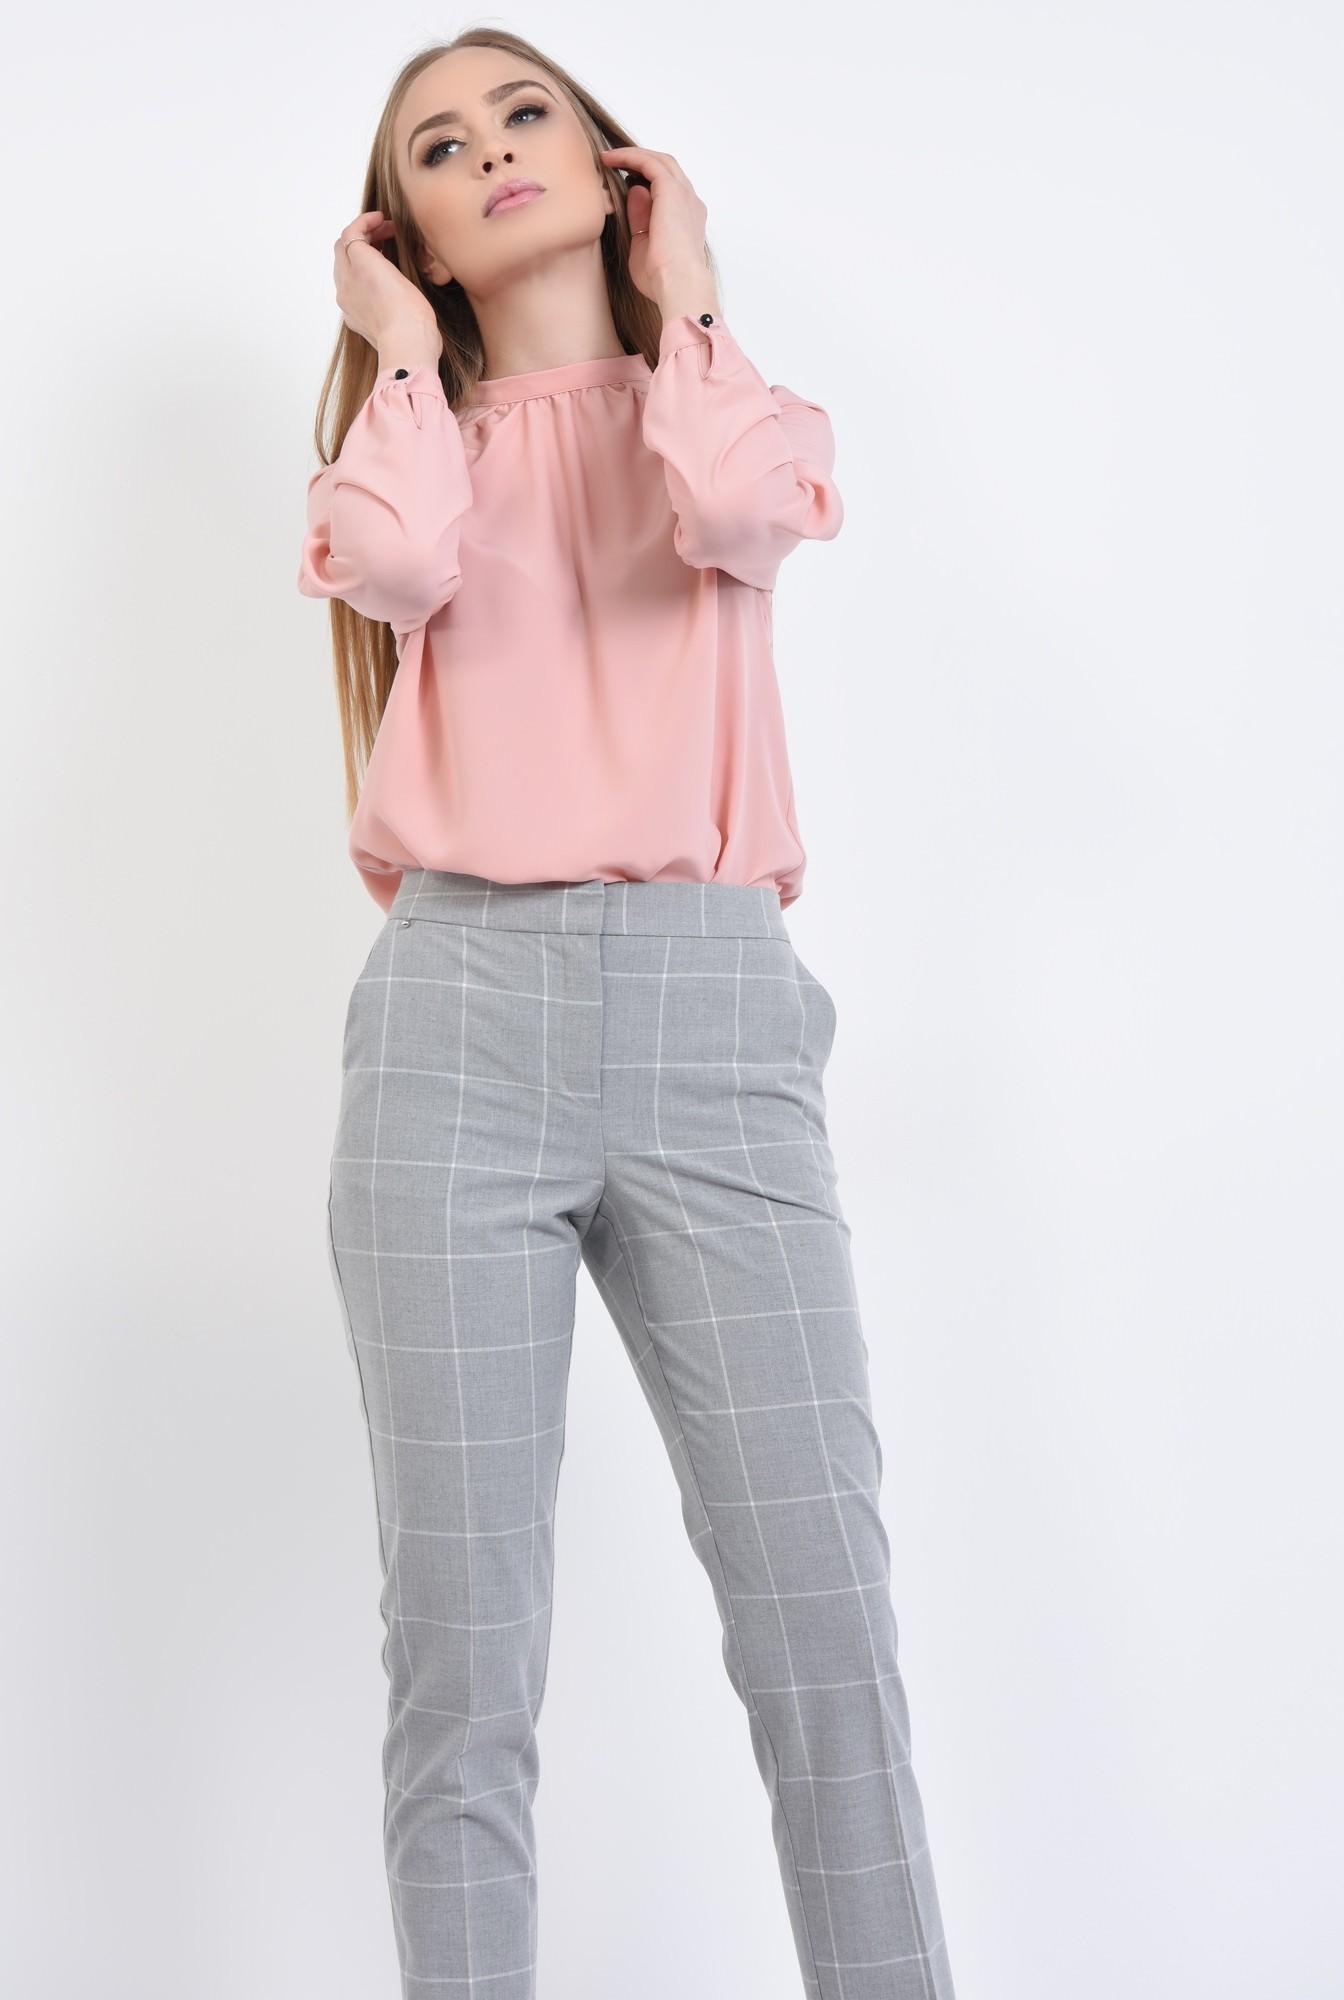 0 - bluza roz, maneci bufante, cu mansete